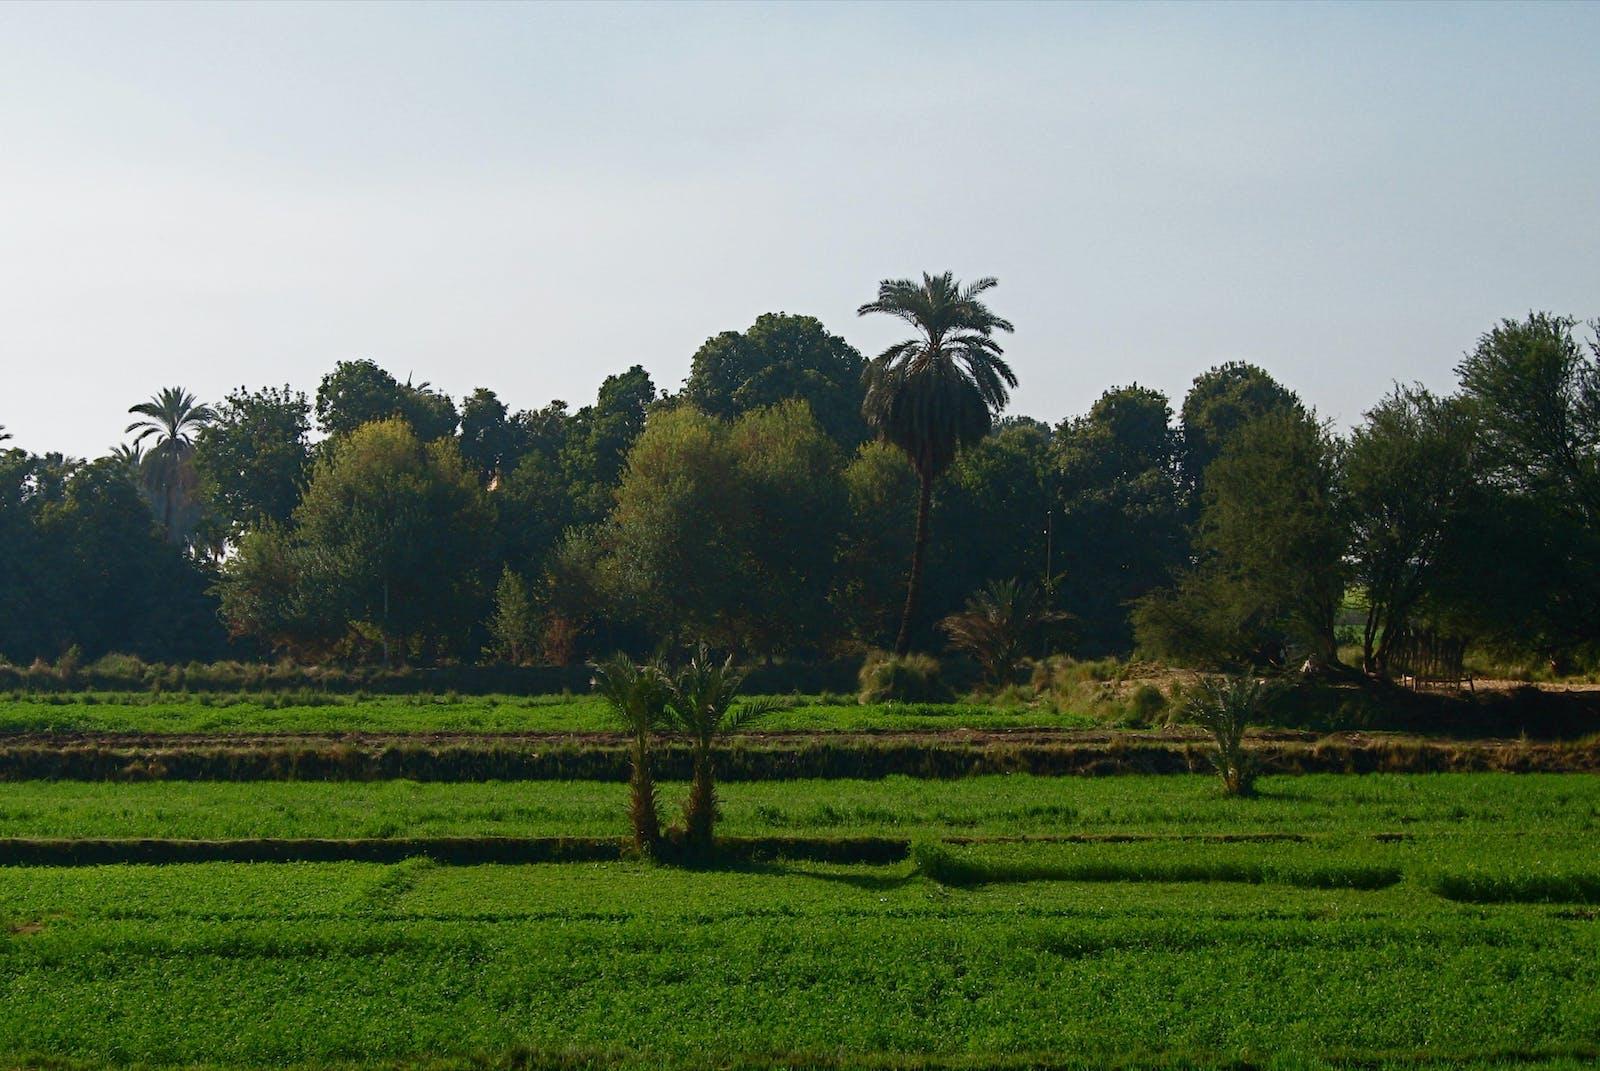 Nile Delta Flooded Savanna